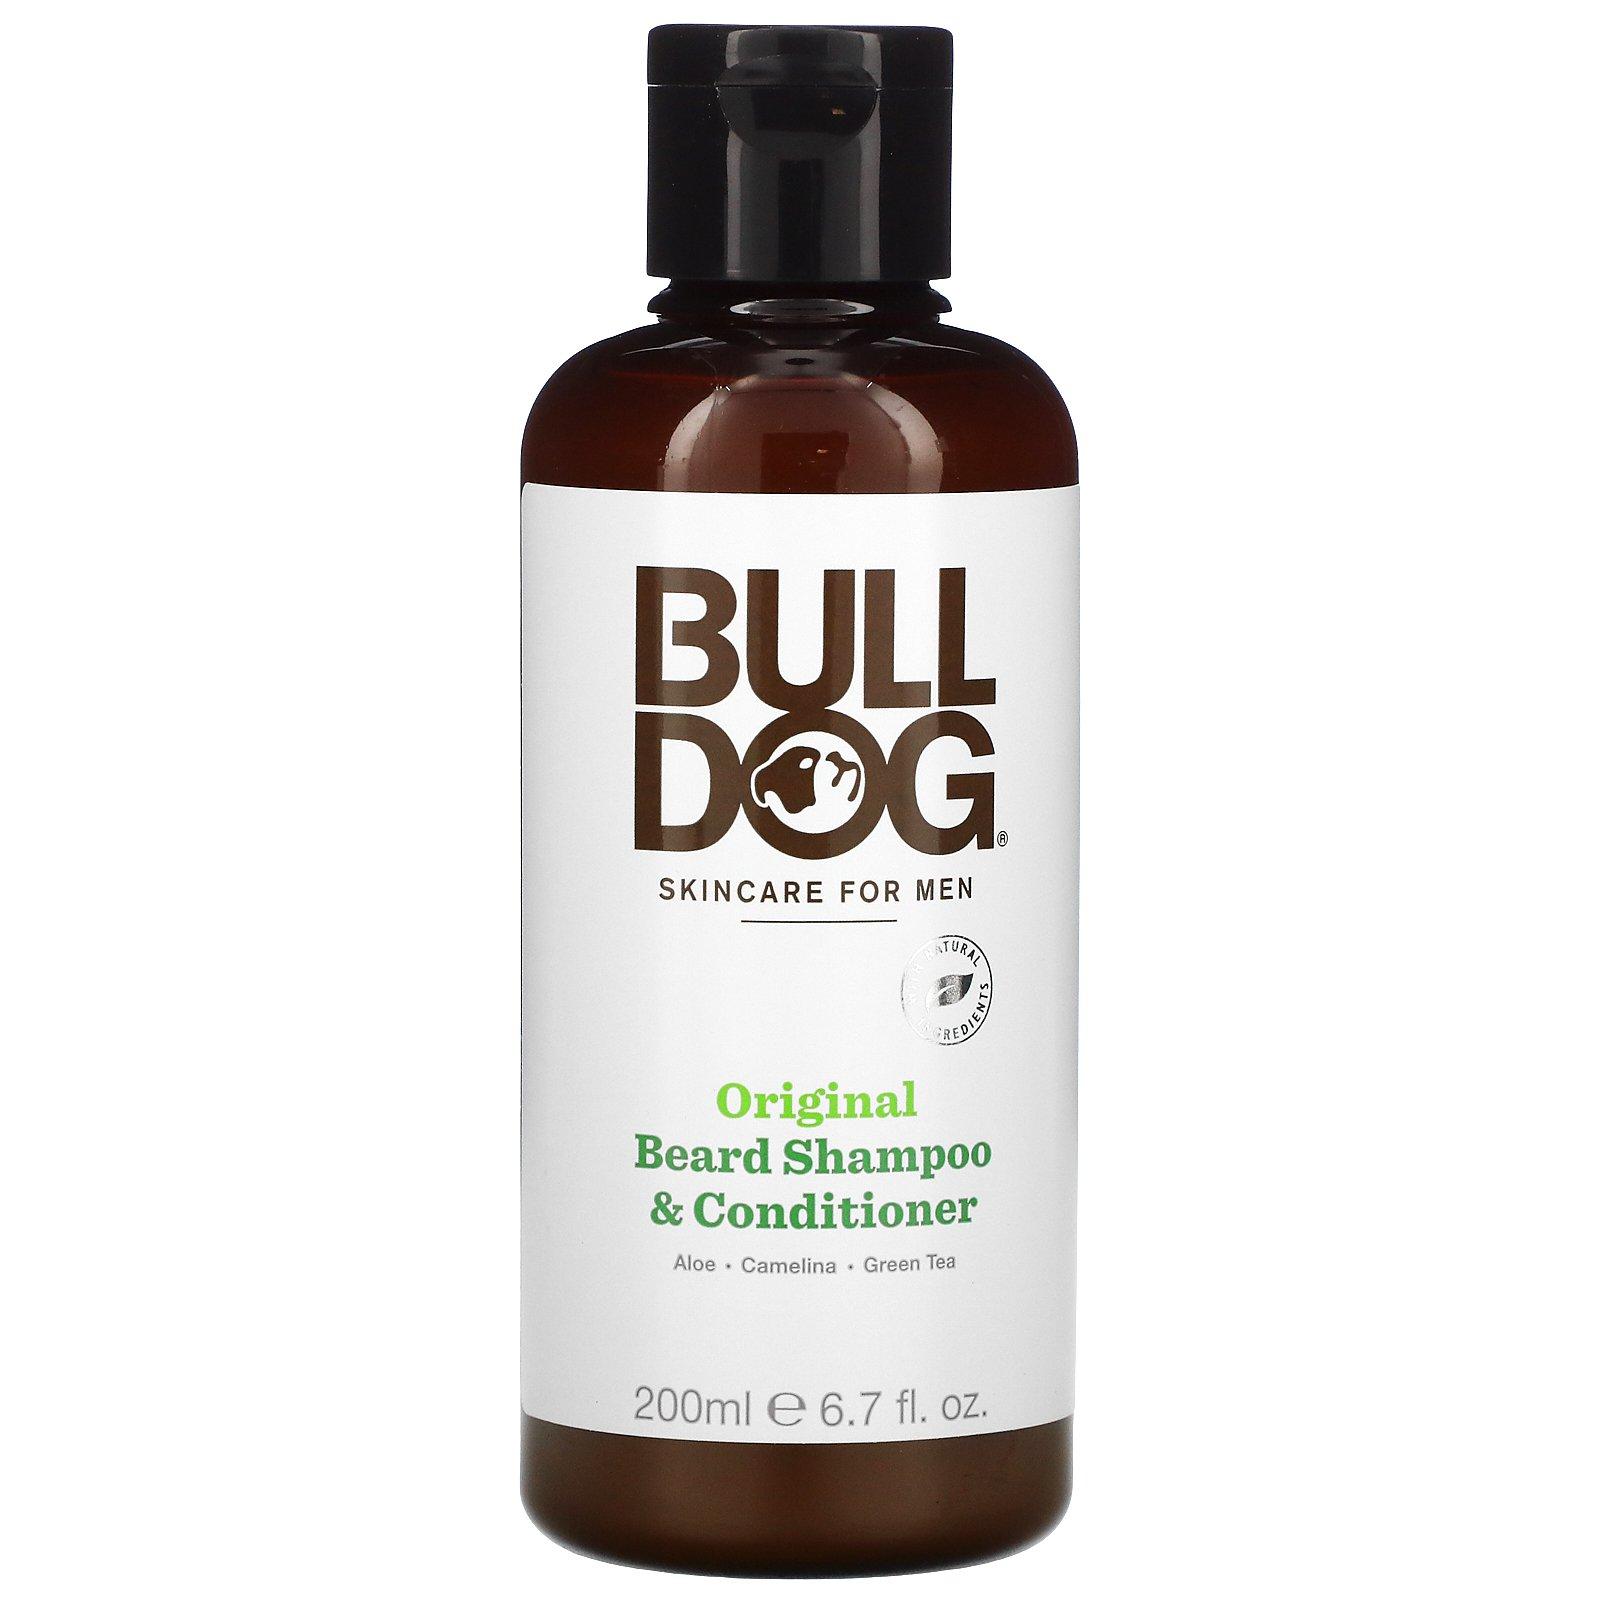 Bulldog Skincare For Men, оригинальный шампунь и кондиционер для бороды, для мужчин, 200мл (6,7жидк.унций)